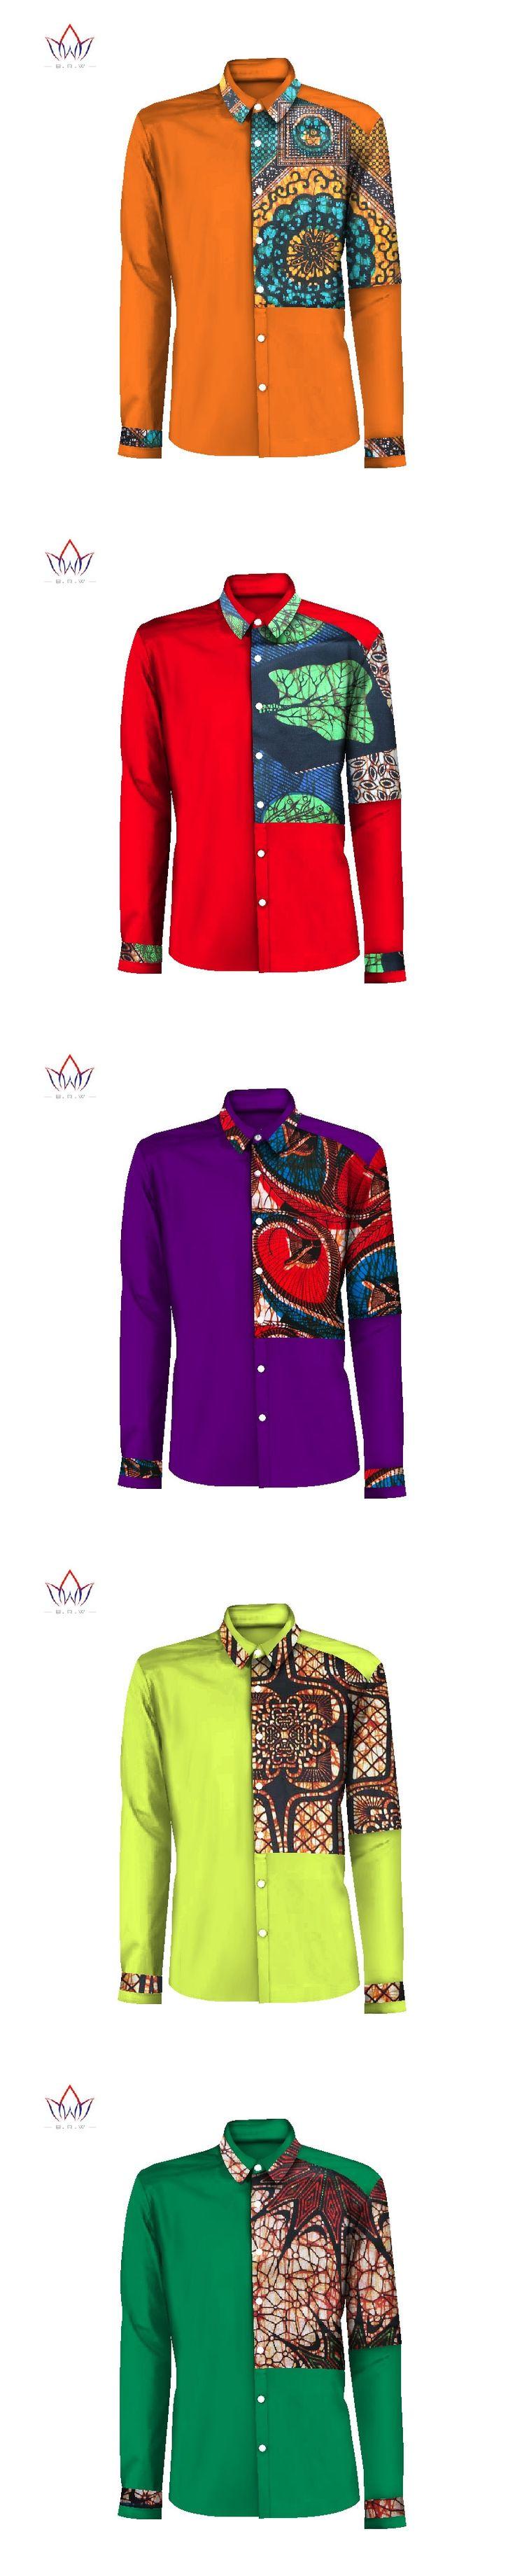 Mens African Clothing Dashiki Men Casual Shirt Men Long Sleeve Slim Fit Dress Shirt Bazin Rich African Men Shirts 6XL BRW WYN296